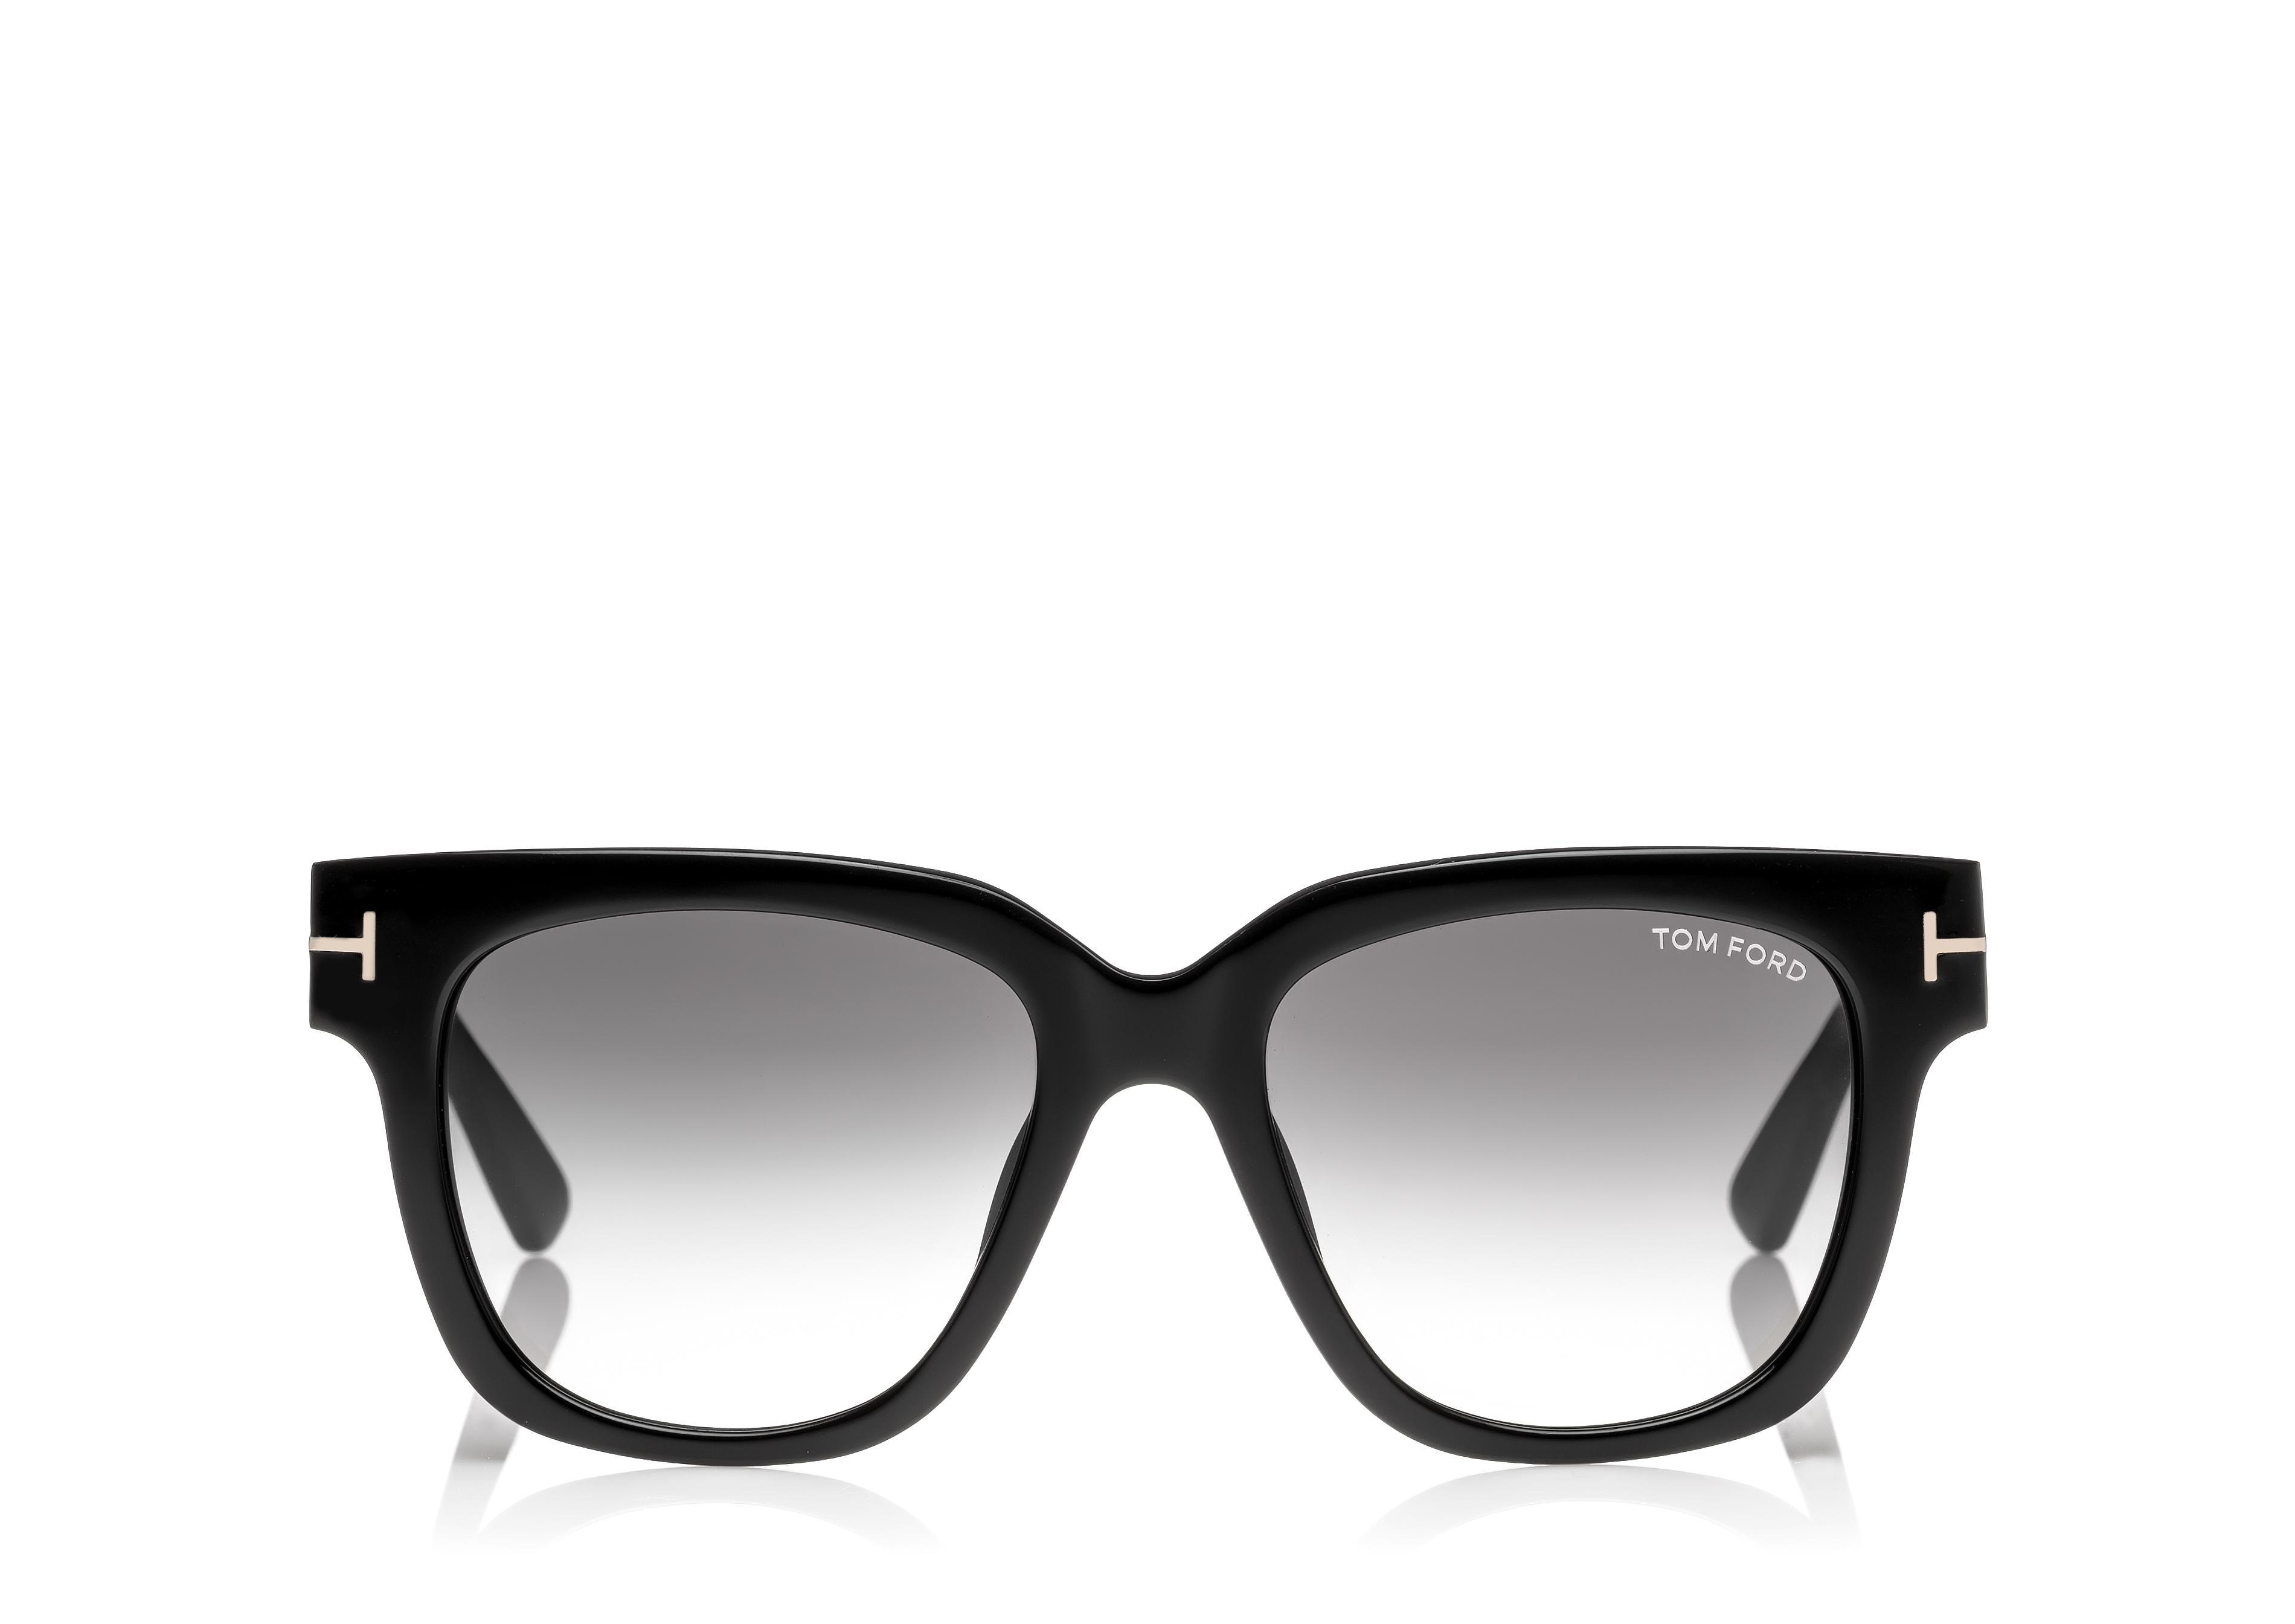 d4b4bcec70 Tom Ford Tracy Sunglasses